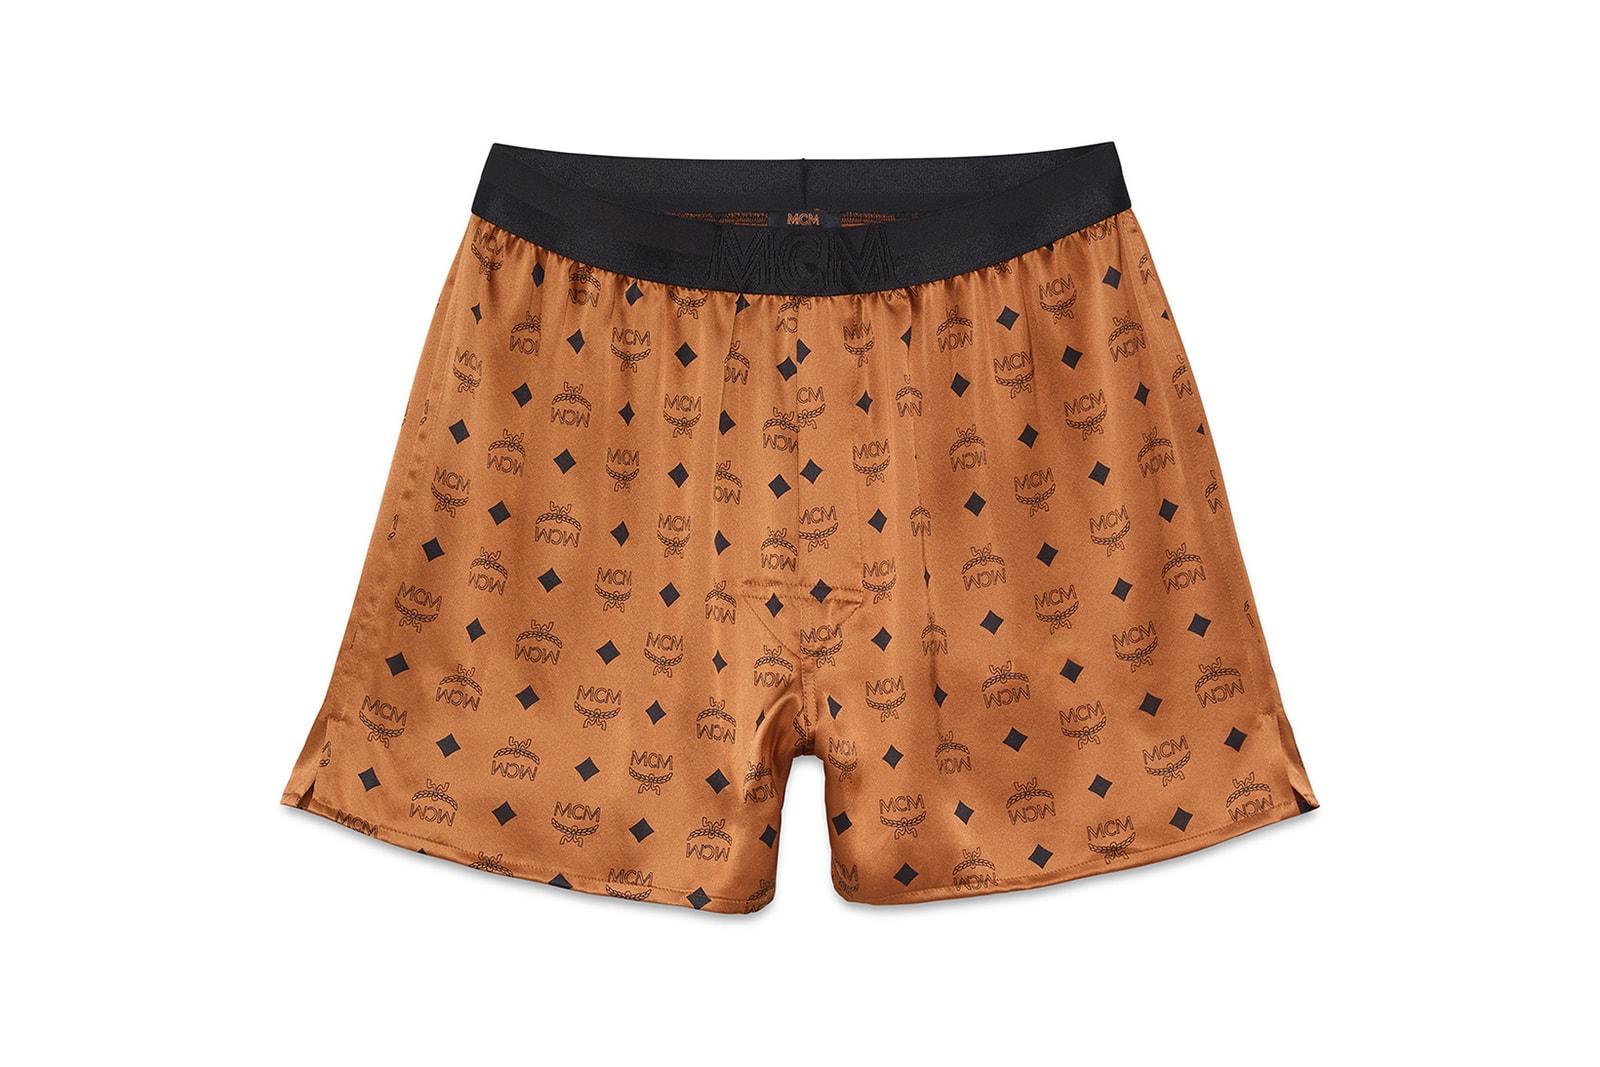 MCM Loungewear Sleepwear Collection Lookbook Robe Pajamas Shorts